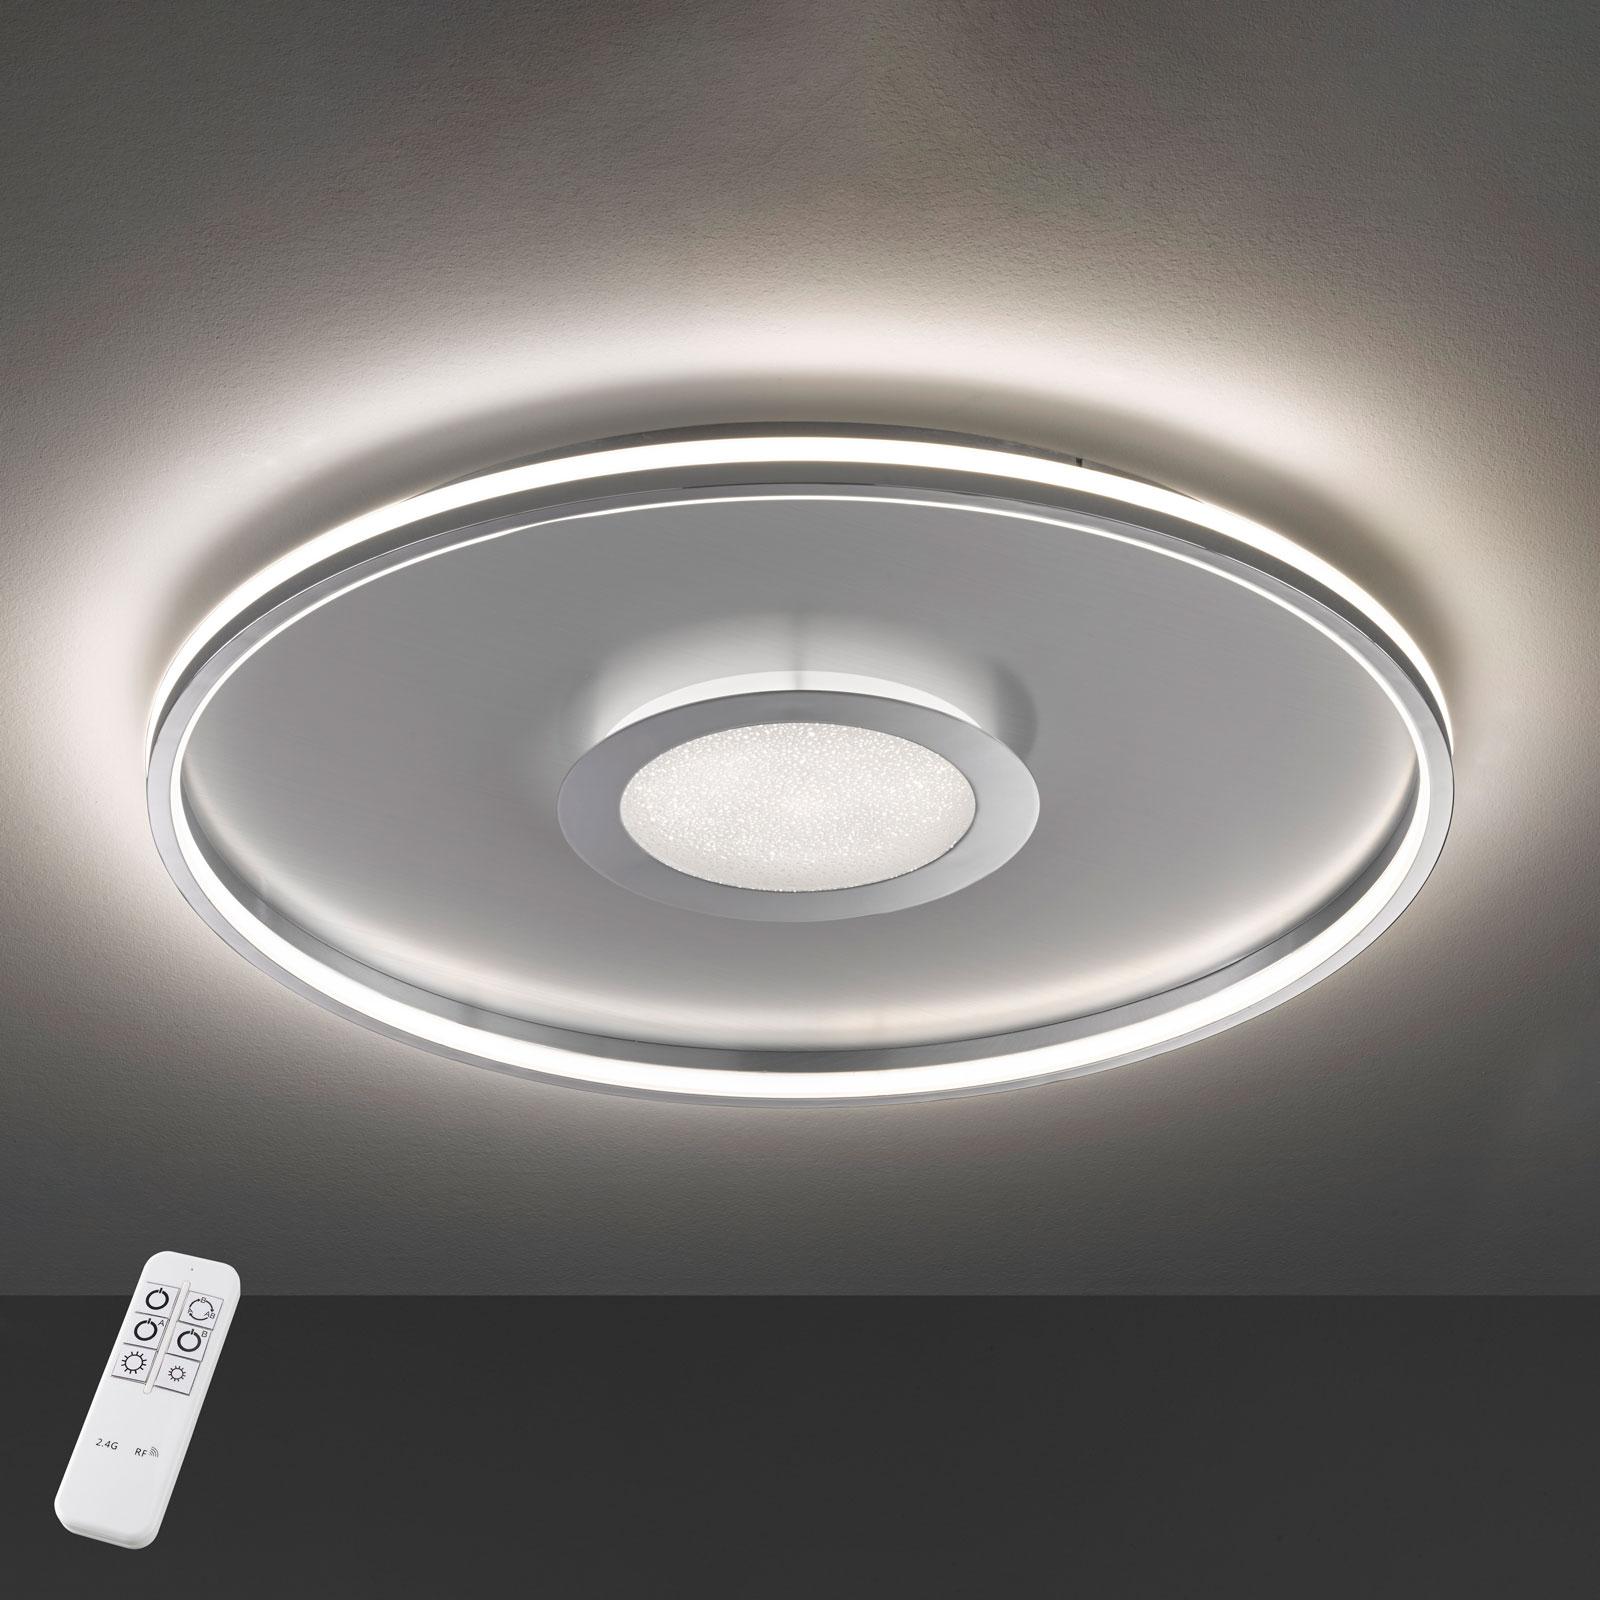 Lampa sufitowa LED Bug okrągła, chrom, 60cm